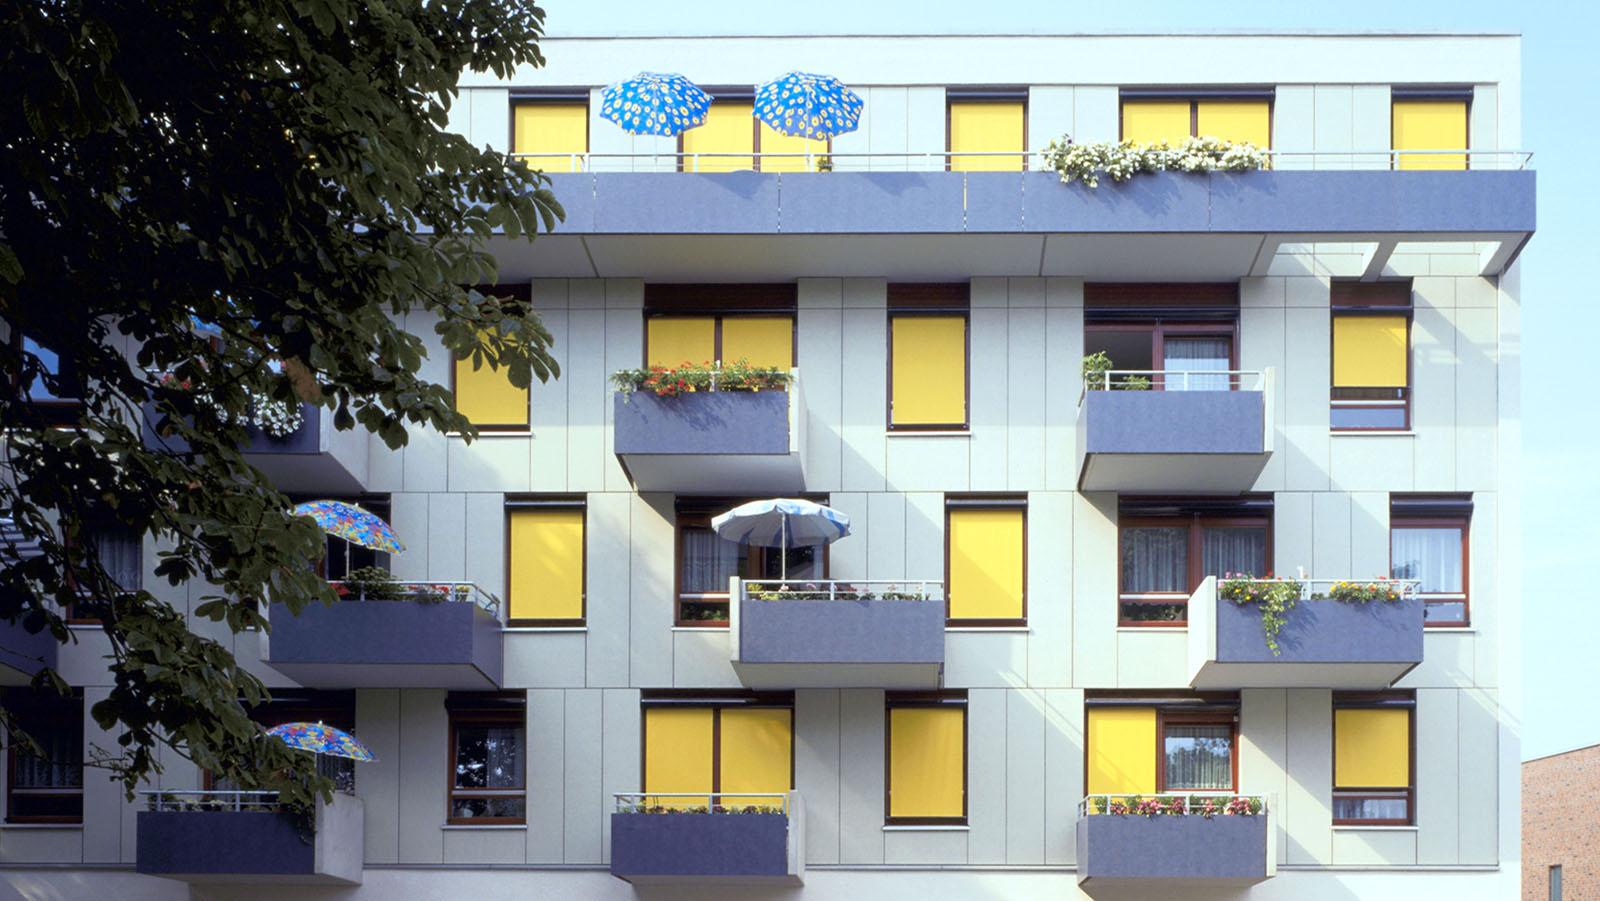 Seniorenzentrum, Berlin-Pankow